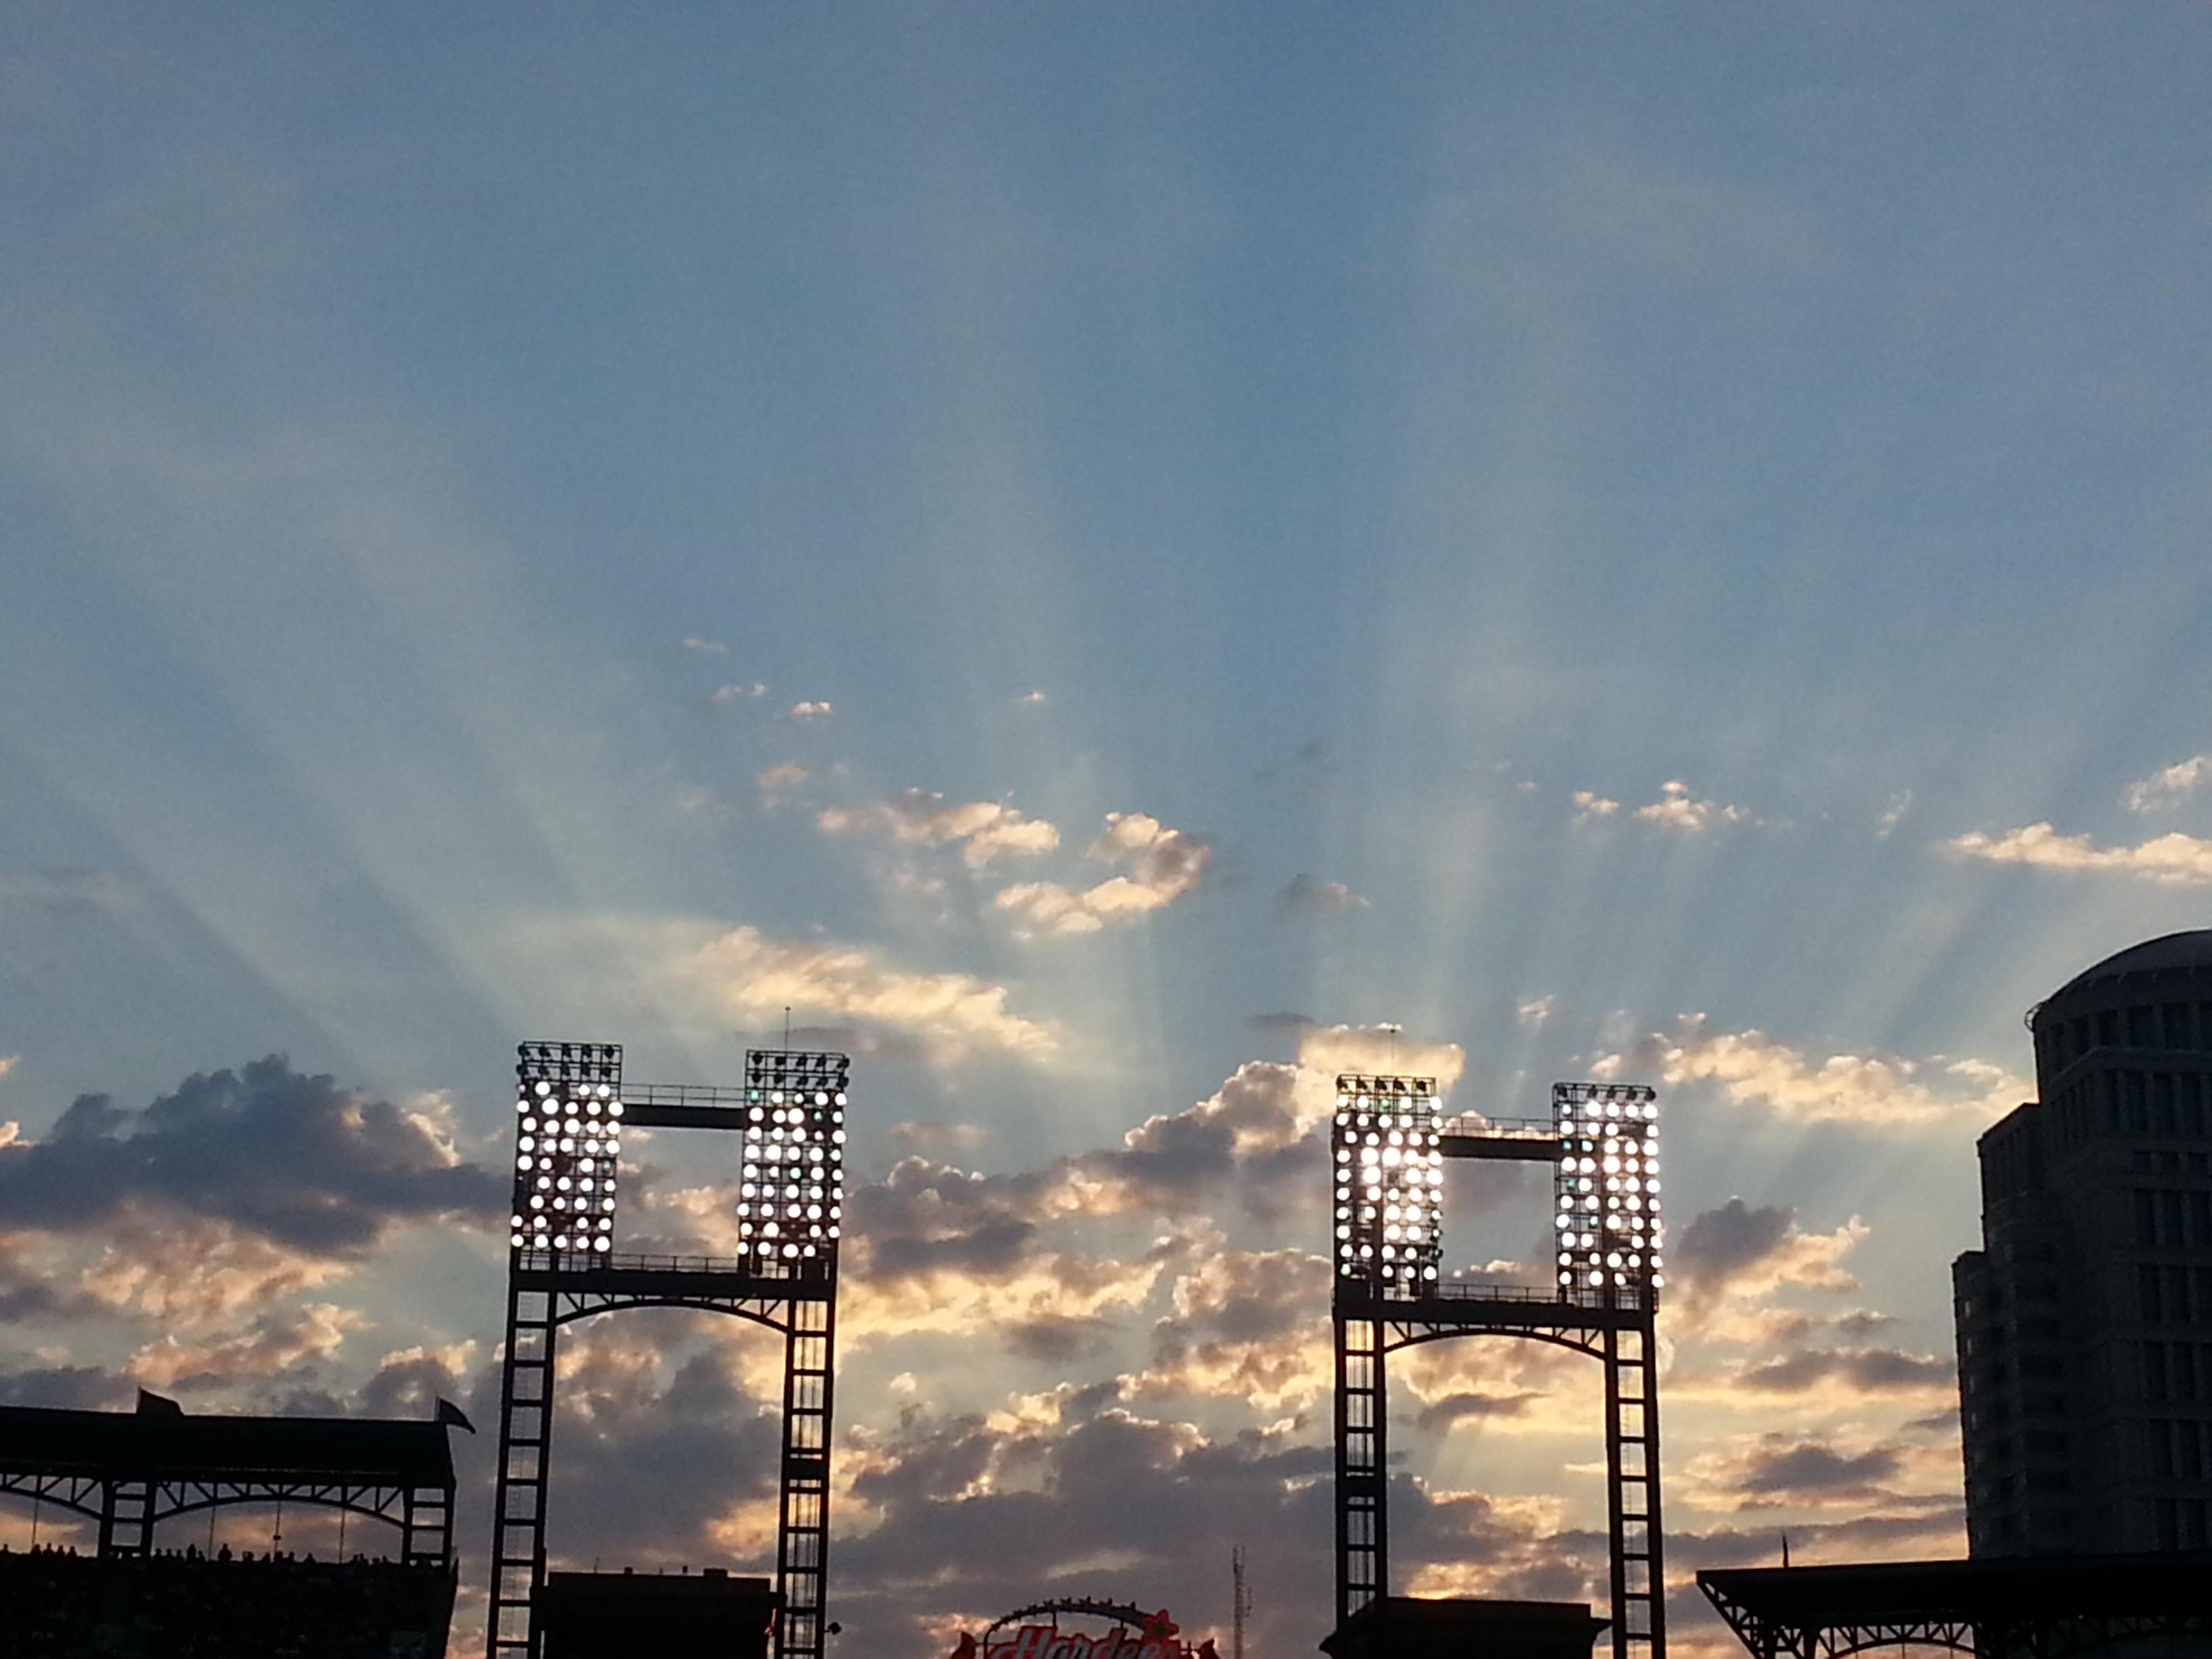 Sunset over Busch Stadium